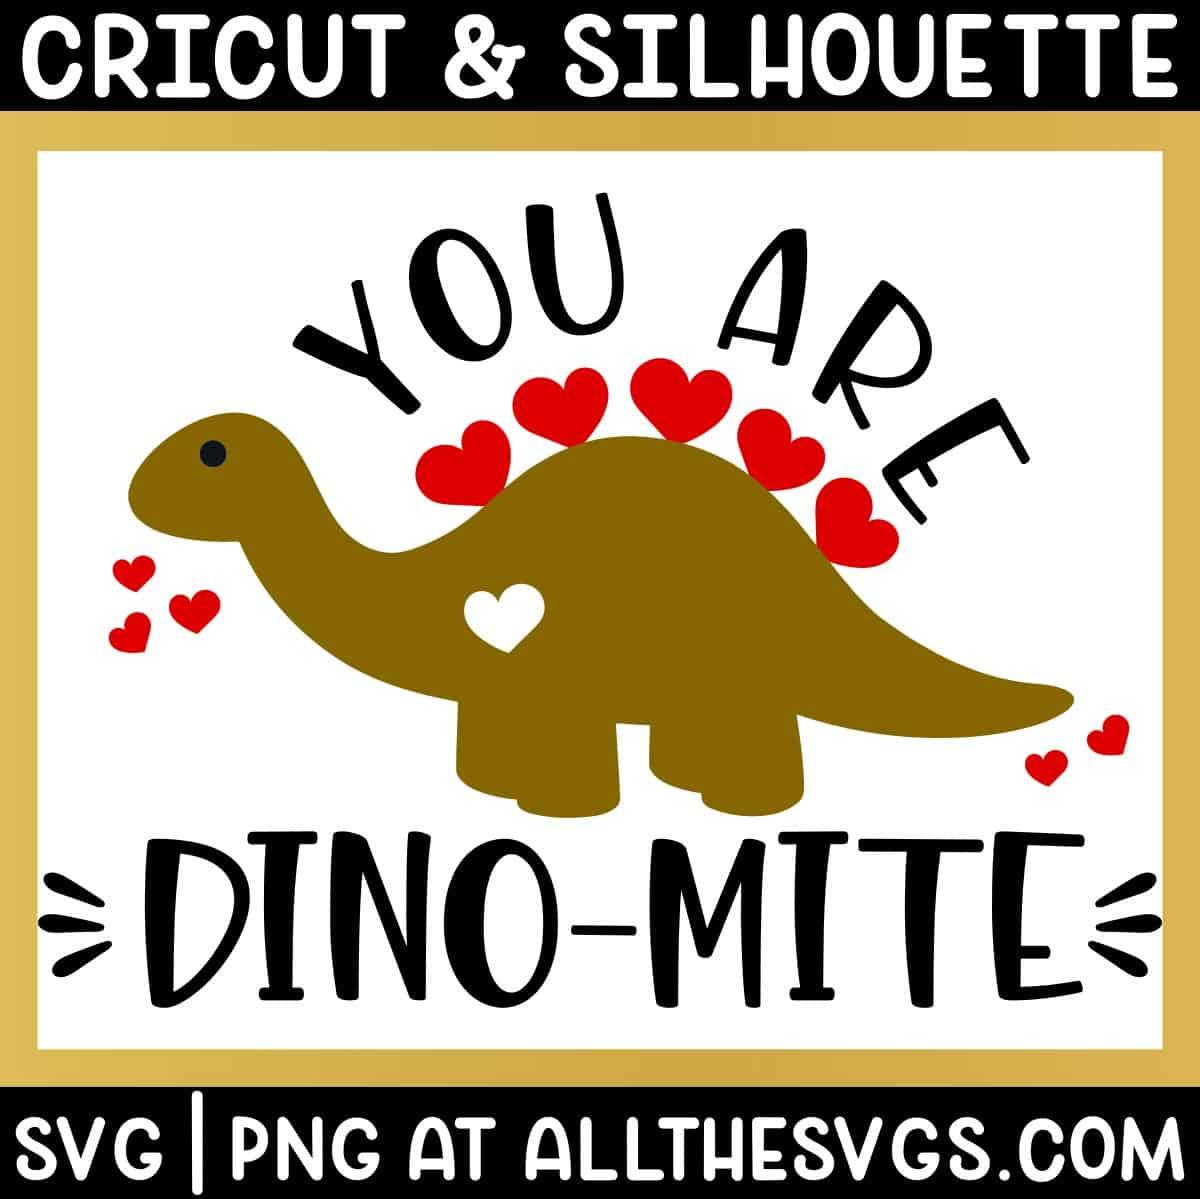 free stegosaurus dinosaur valentine svg png with you are dinomite around body.